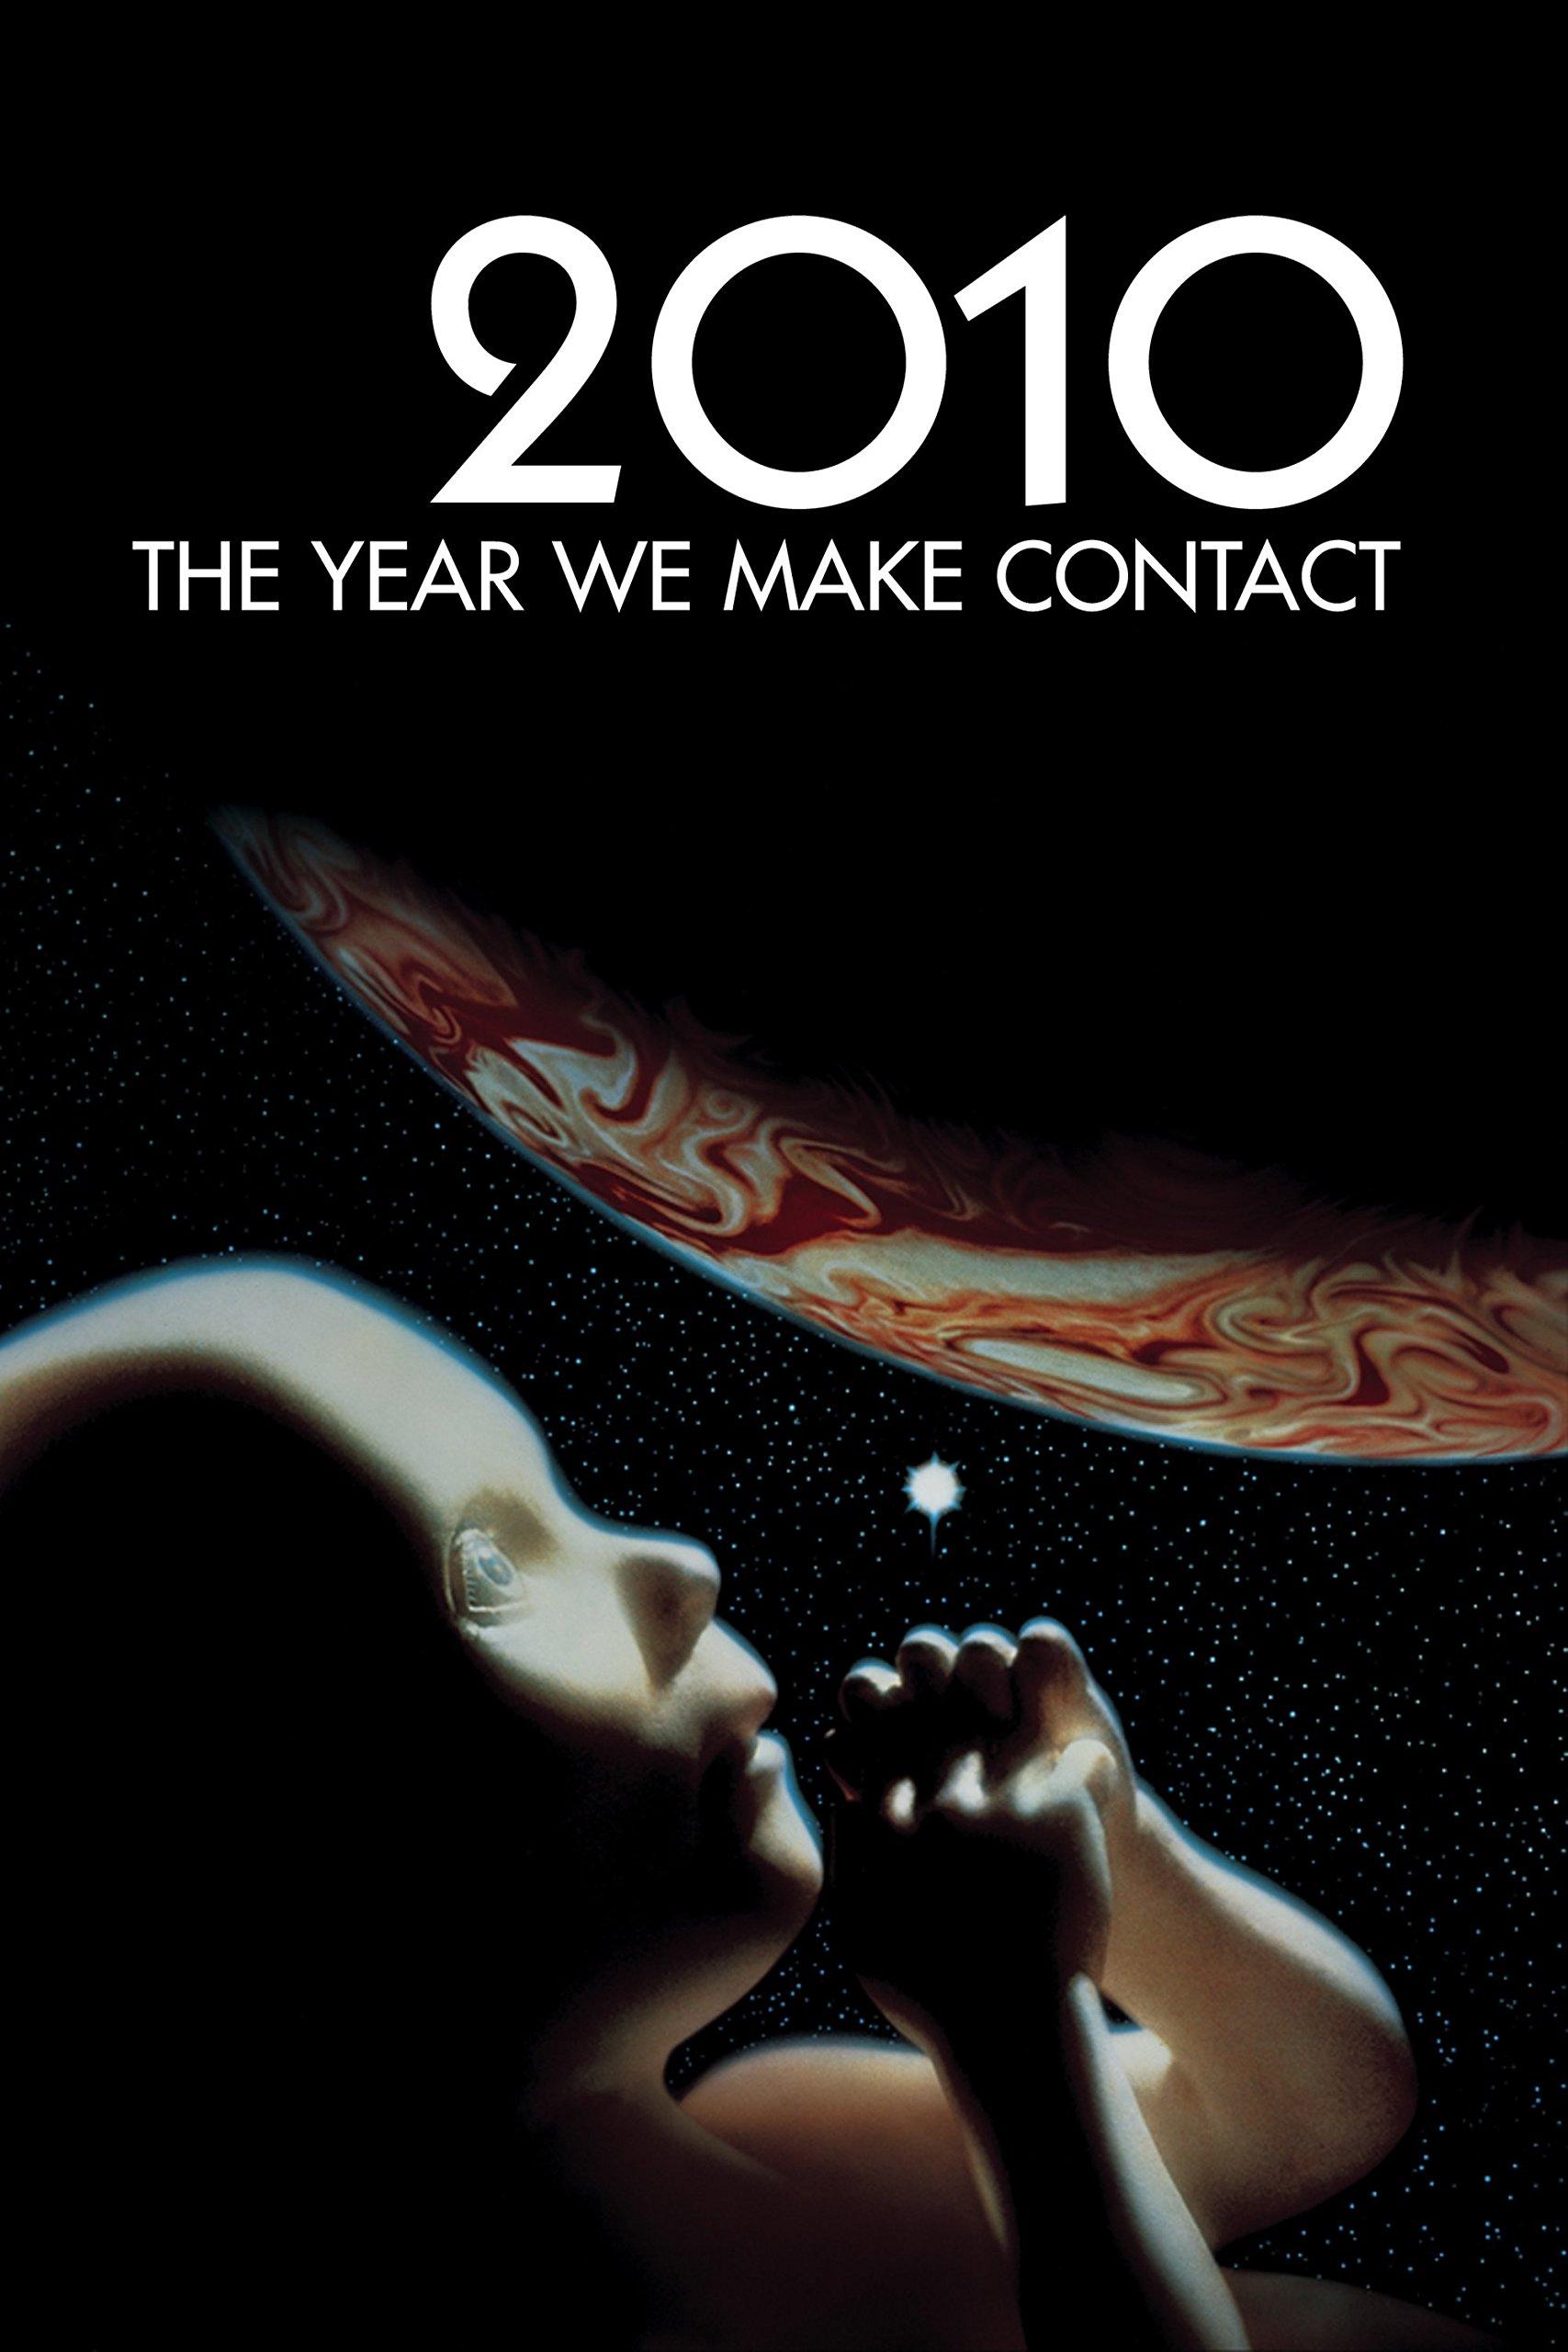 amazon com 2010 the year we make contact roy scheider douglas